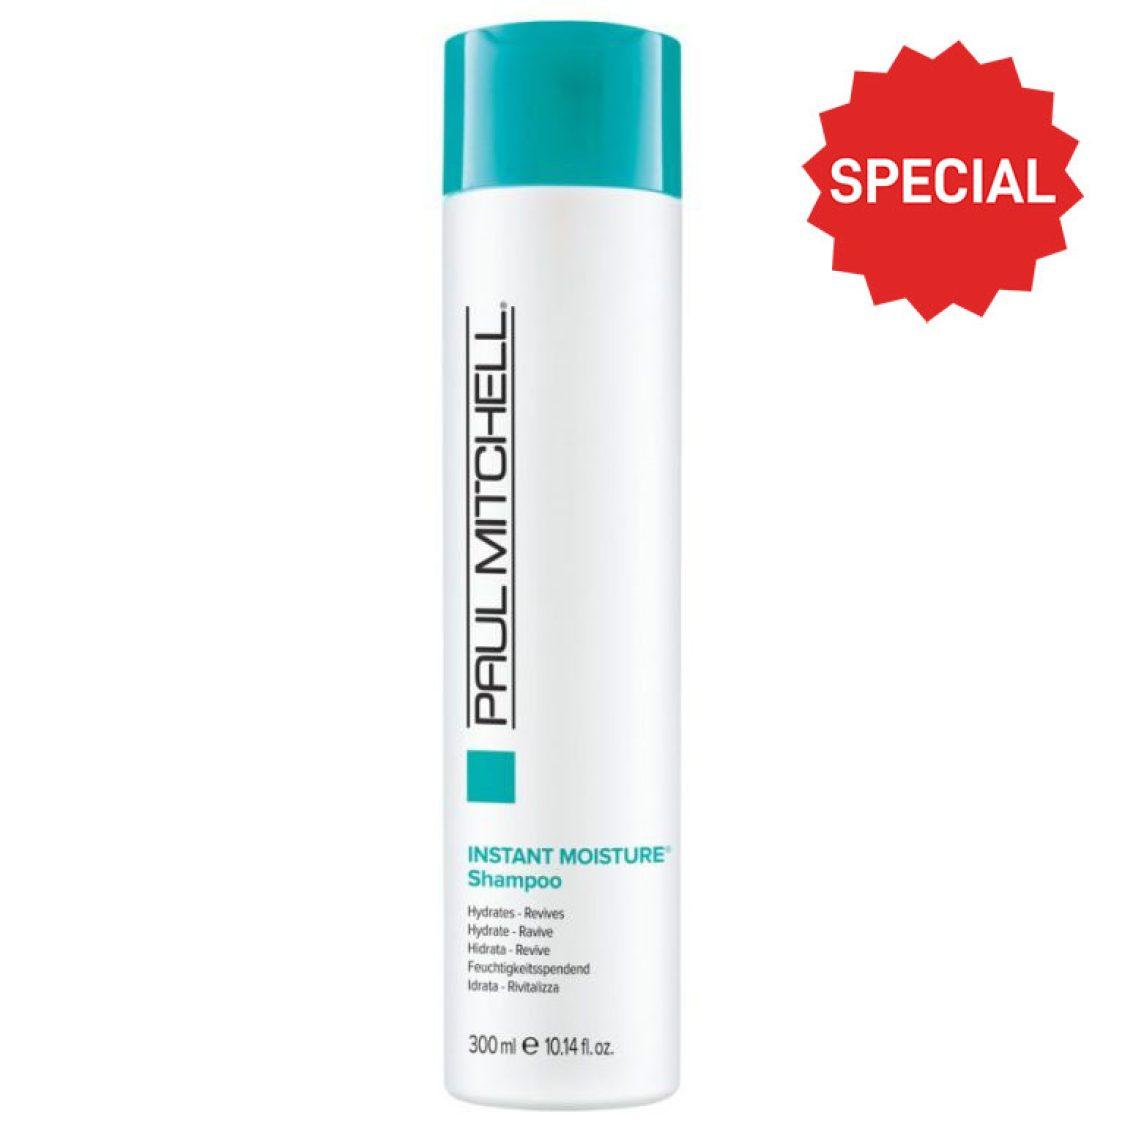 Paul Mitchell - Moisture - Instant Moisture Daily Shampoo 300ml